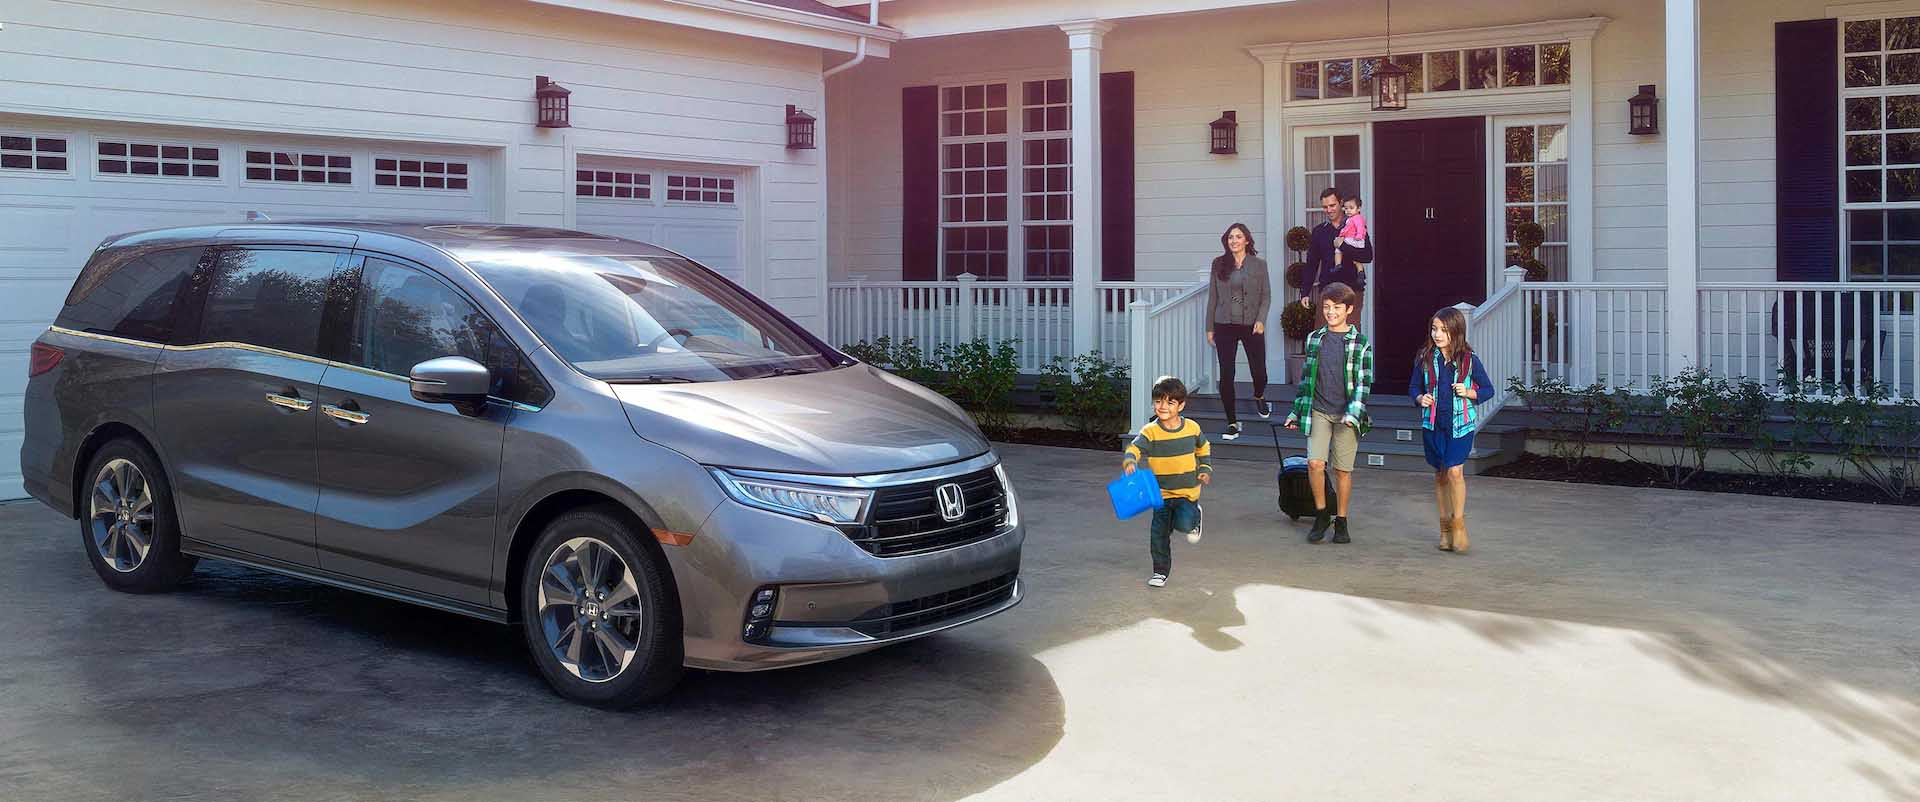 2021 Honda Odyssey For Sale In Midland, Texas